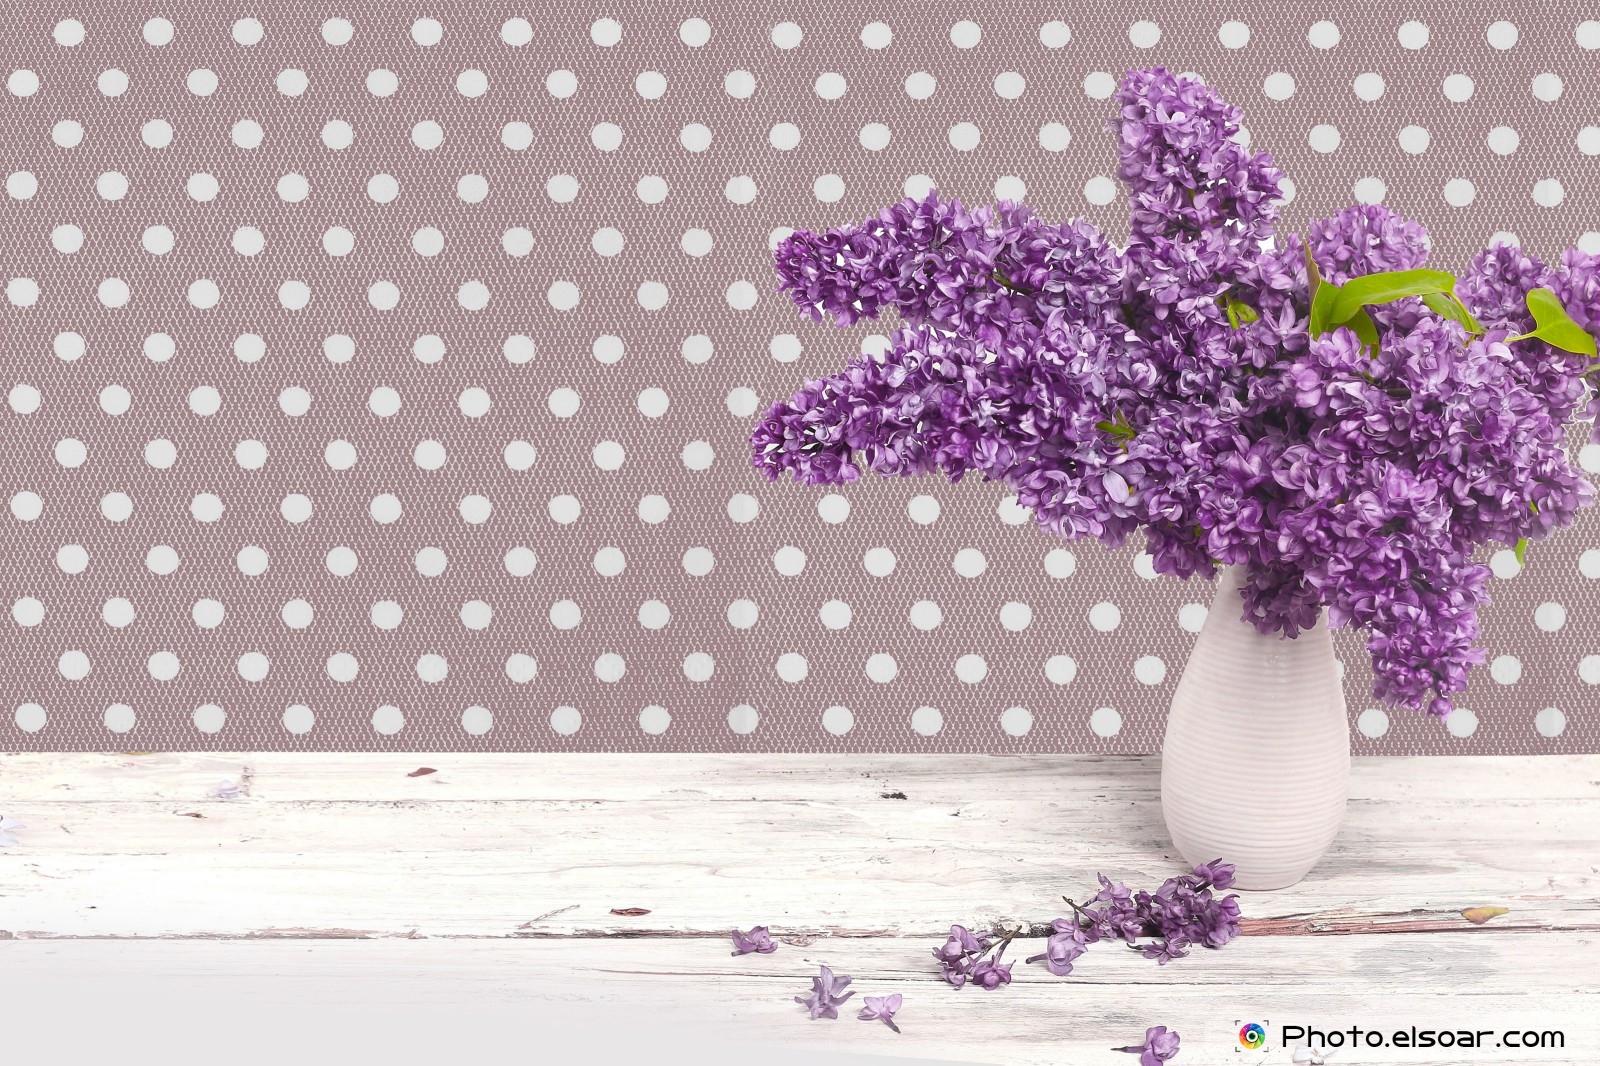 download wallpaper 1024x600 lilac - photo #32